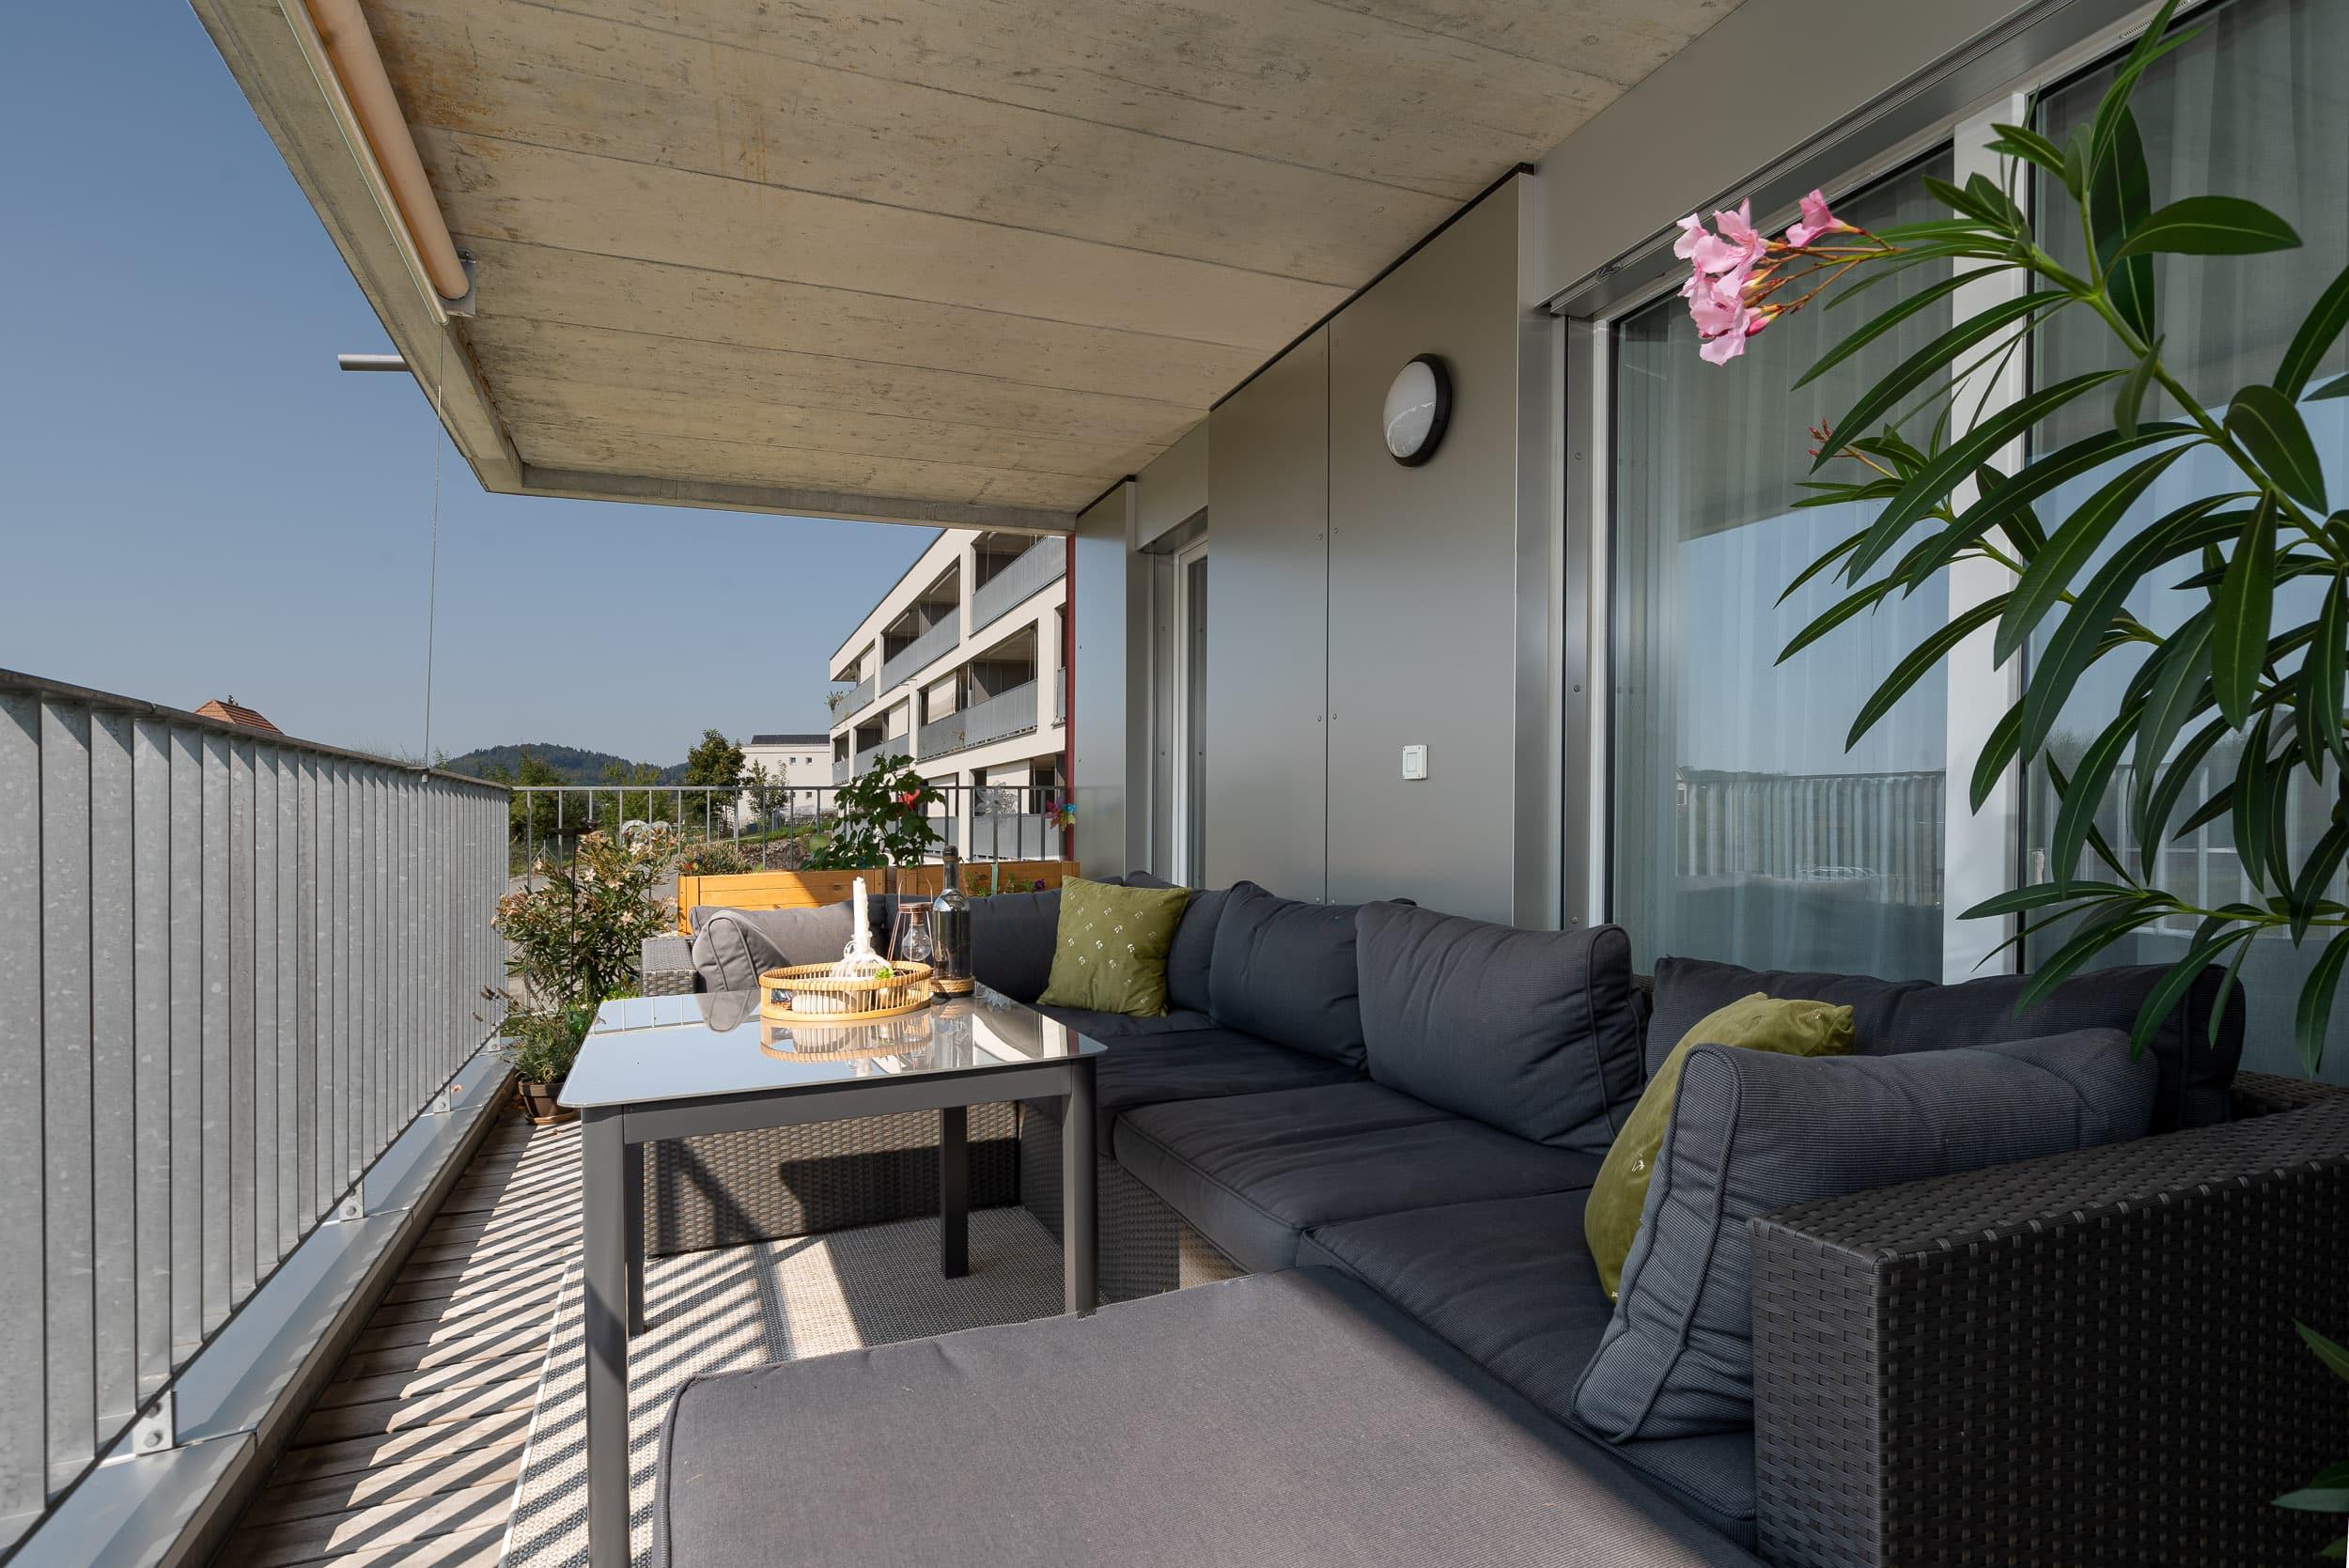 Neubauwohnung Sommerrain Ostermundigen - Balkon